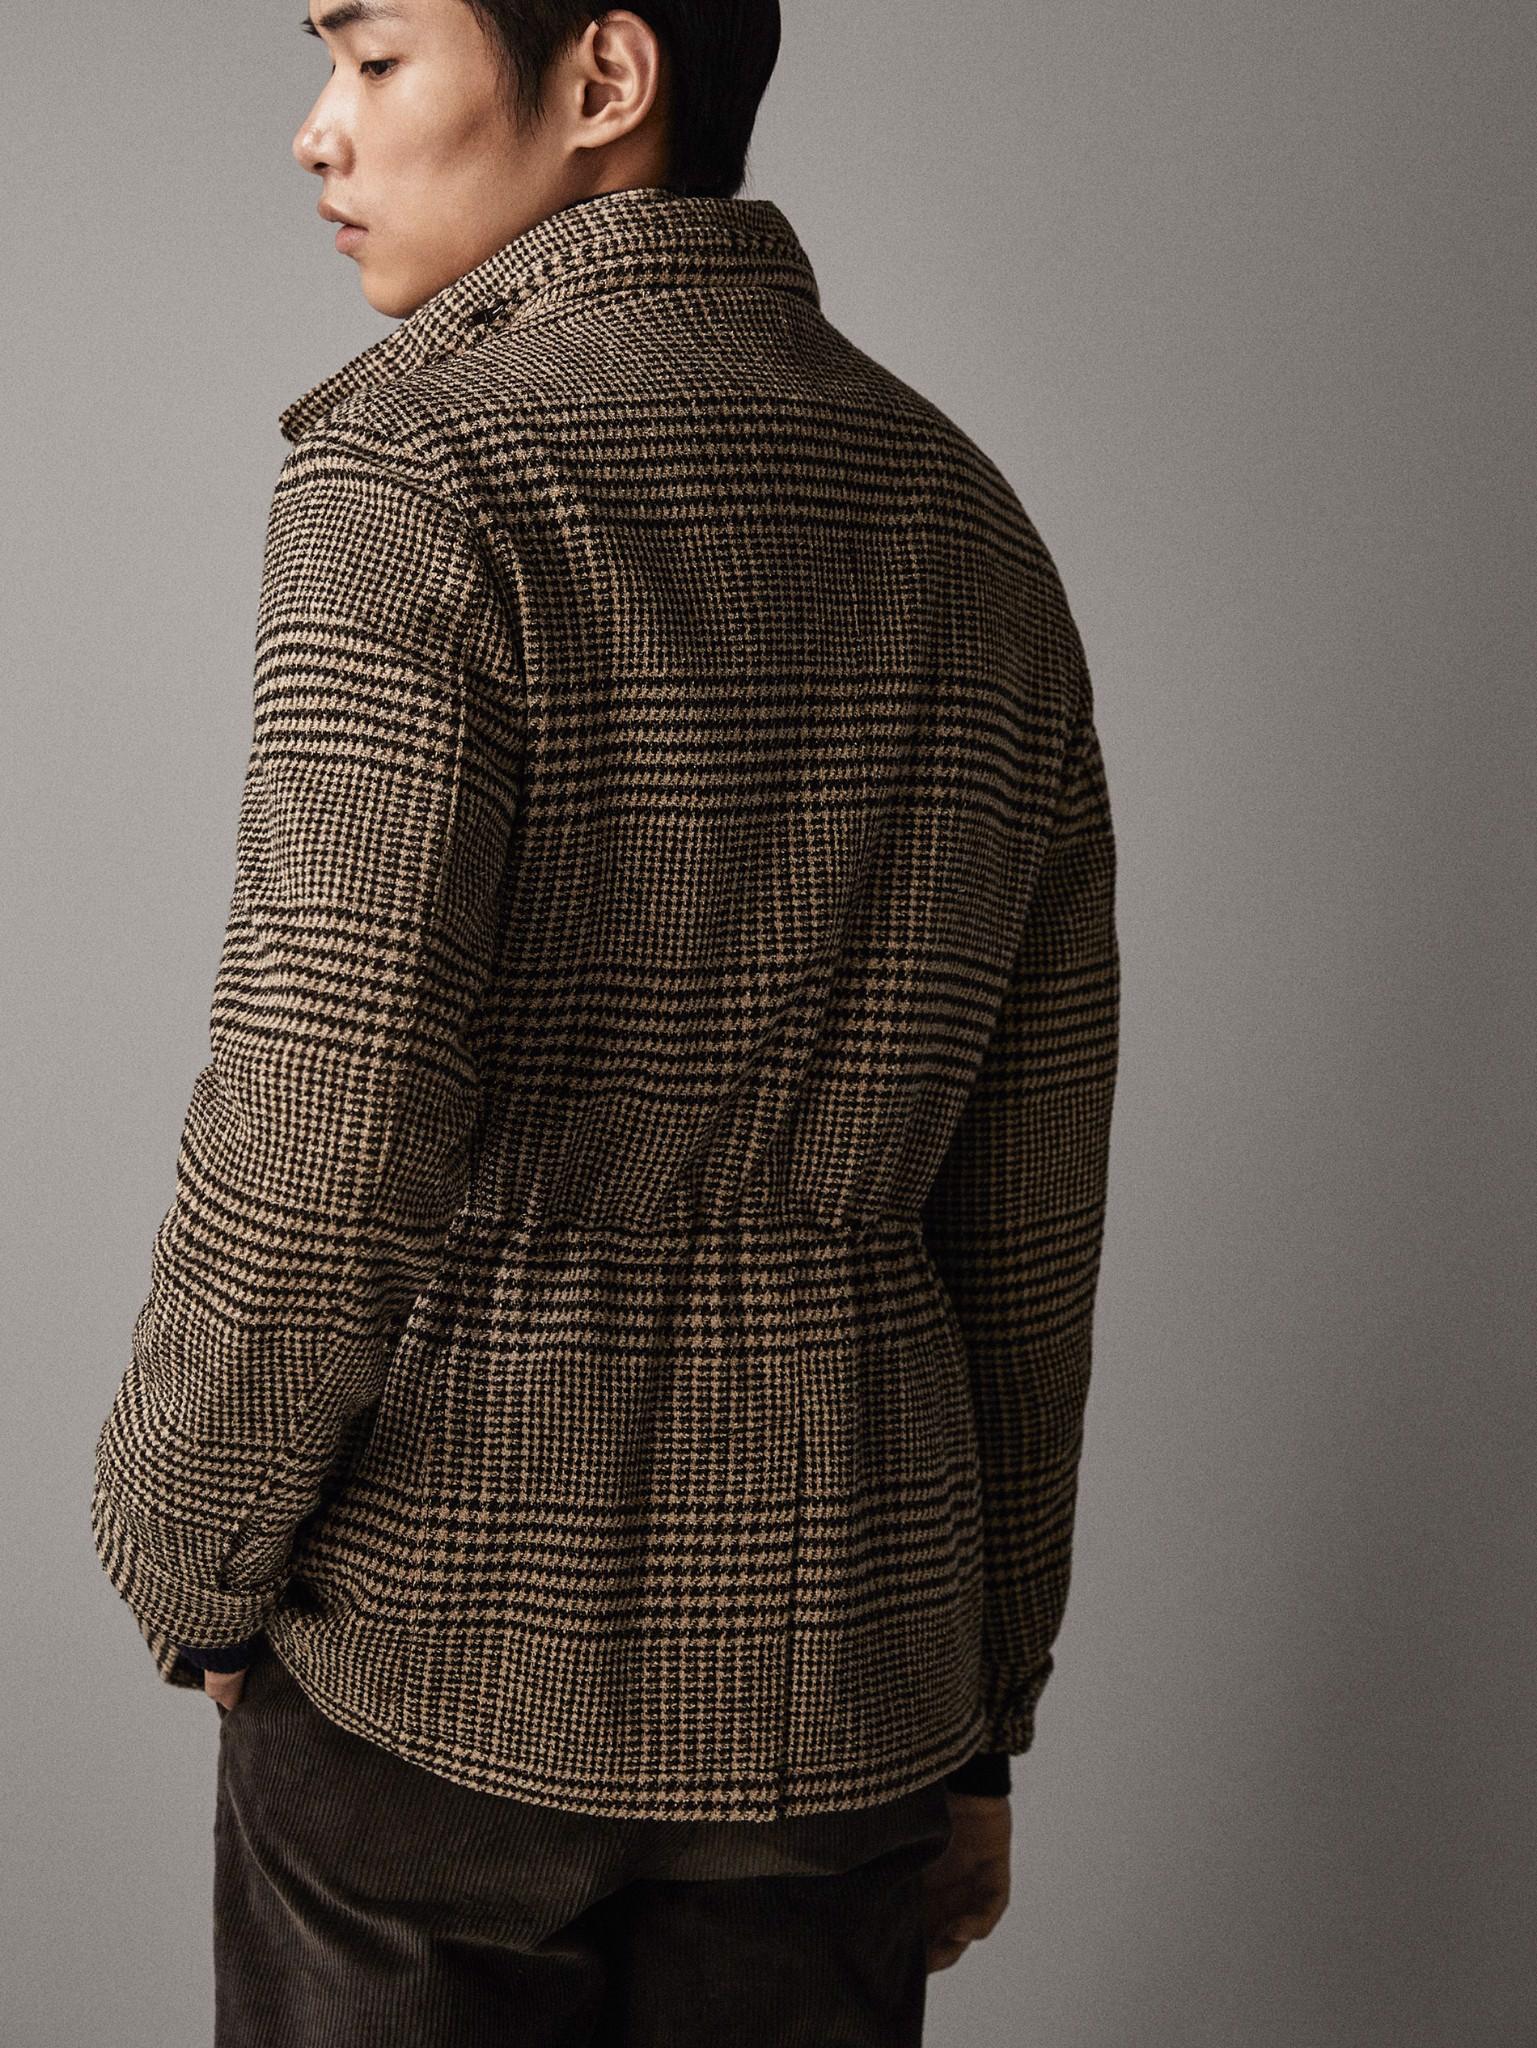 hooded-houndstooth-blazer